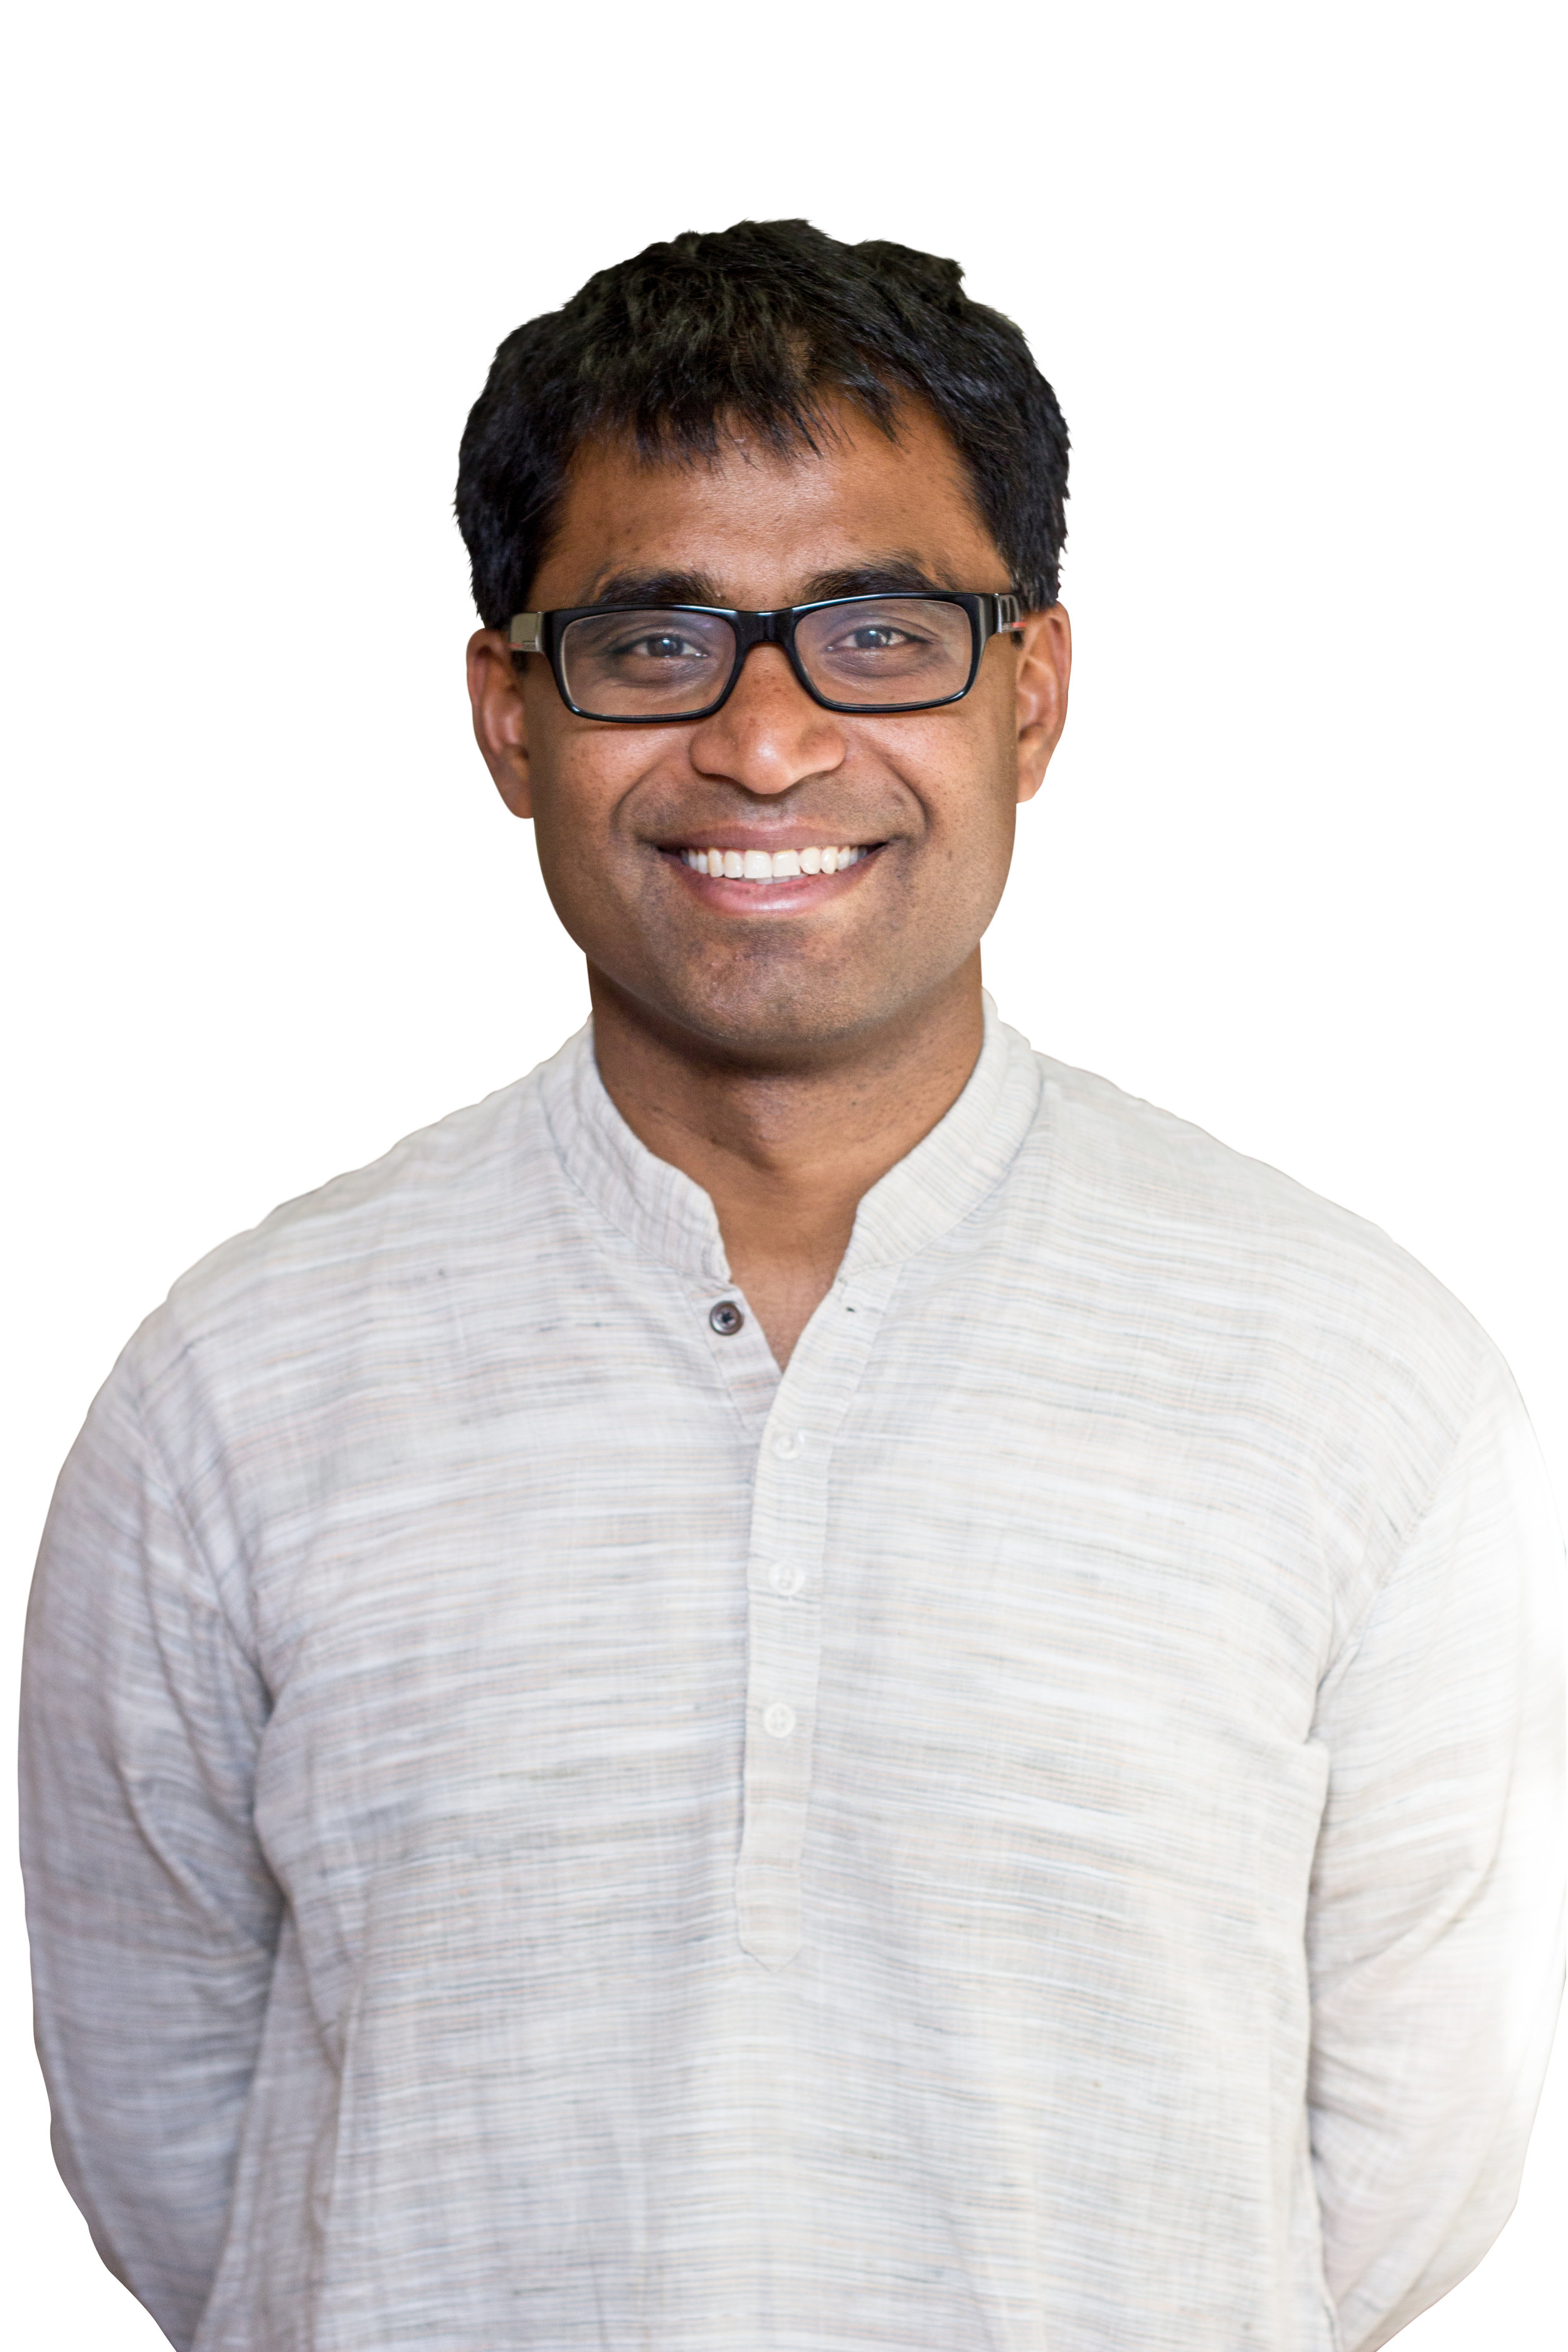 Dhananjayan Sriskandarajah